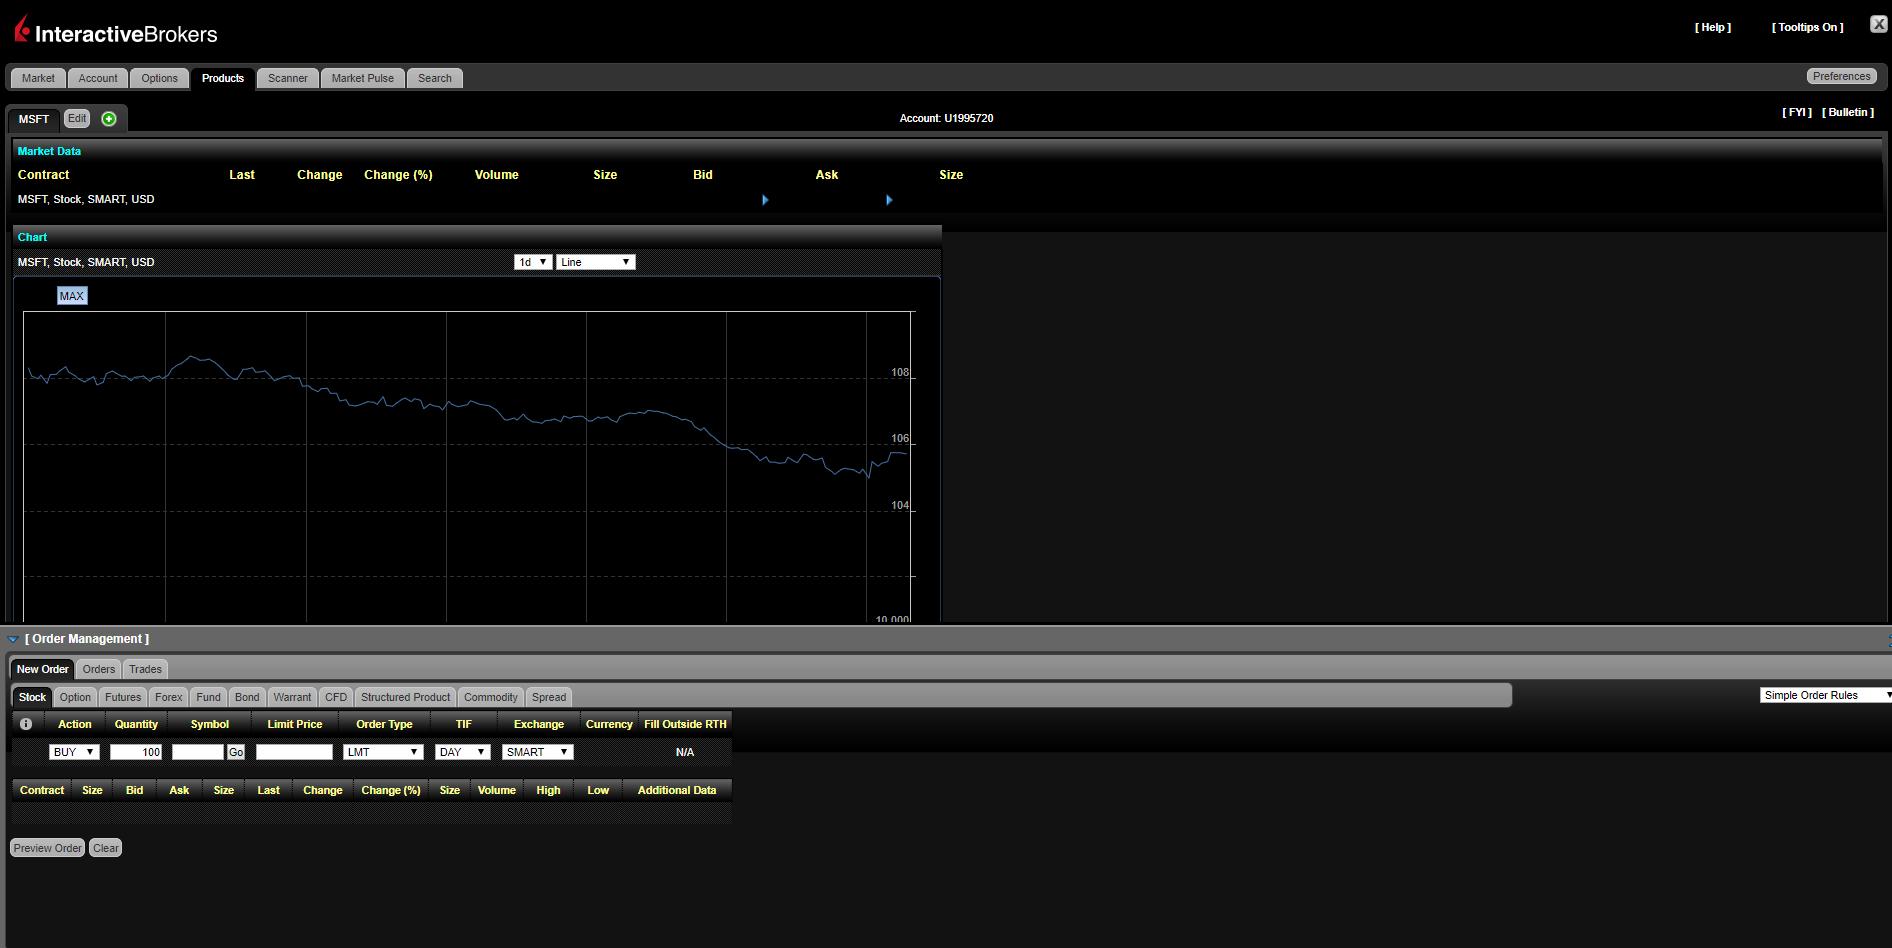 Best discount brokers - TradeStation Global trading platform